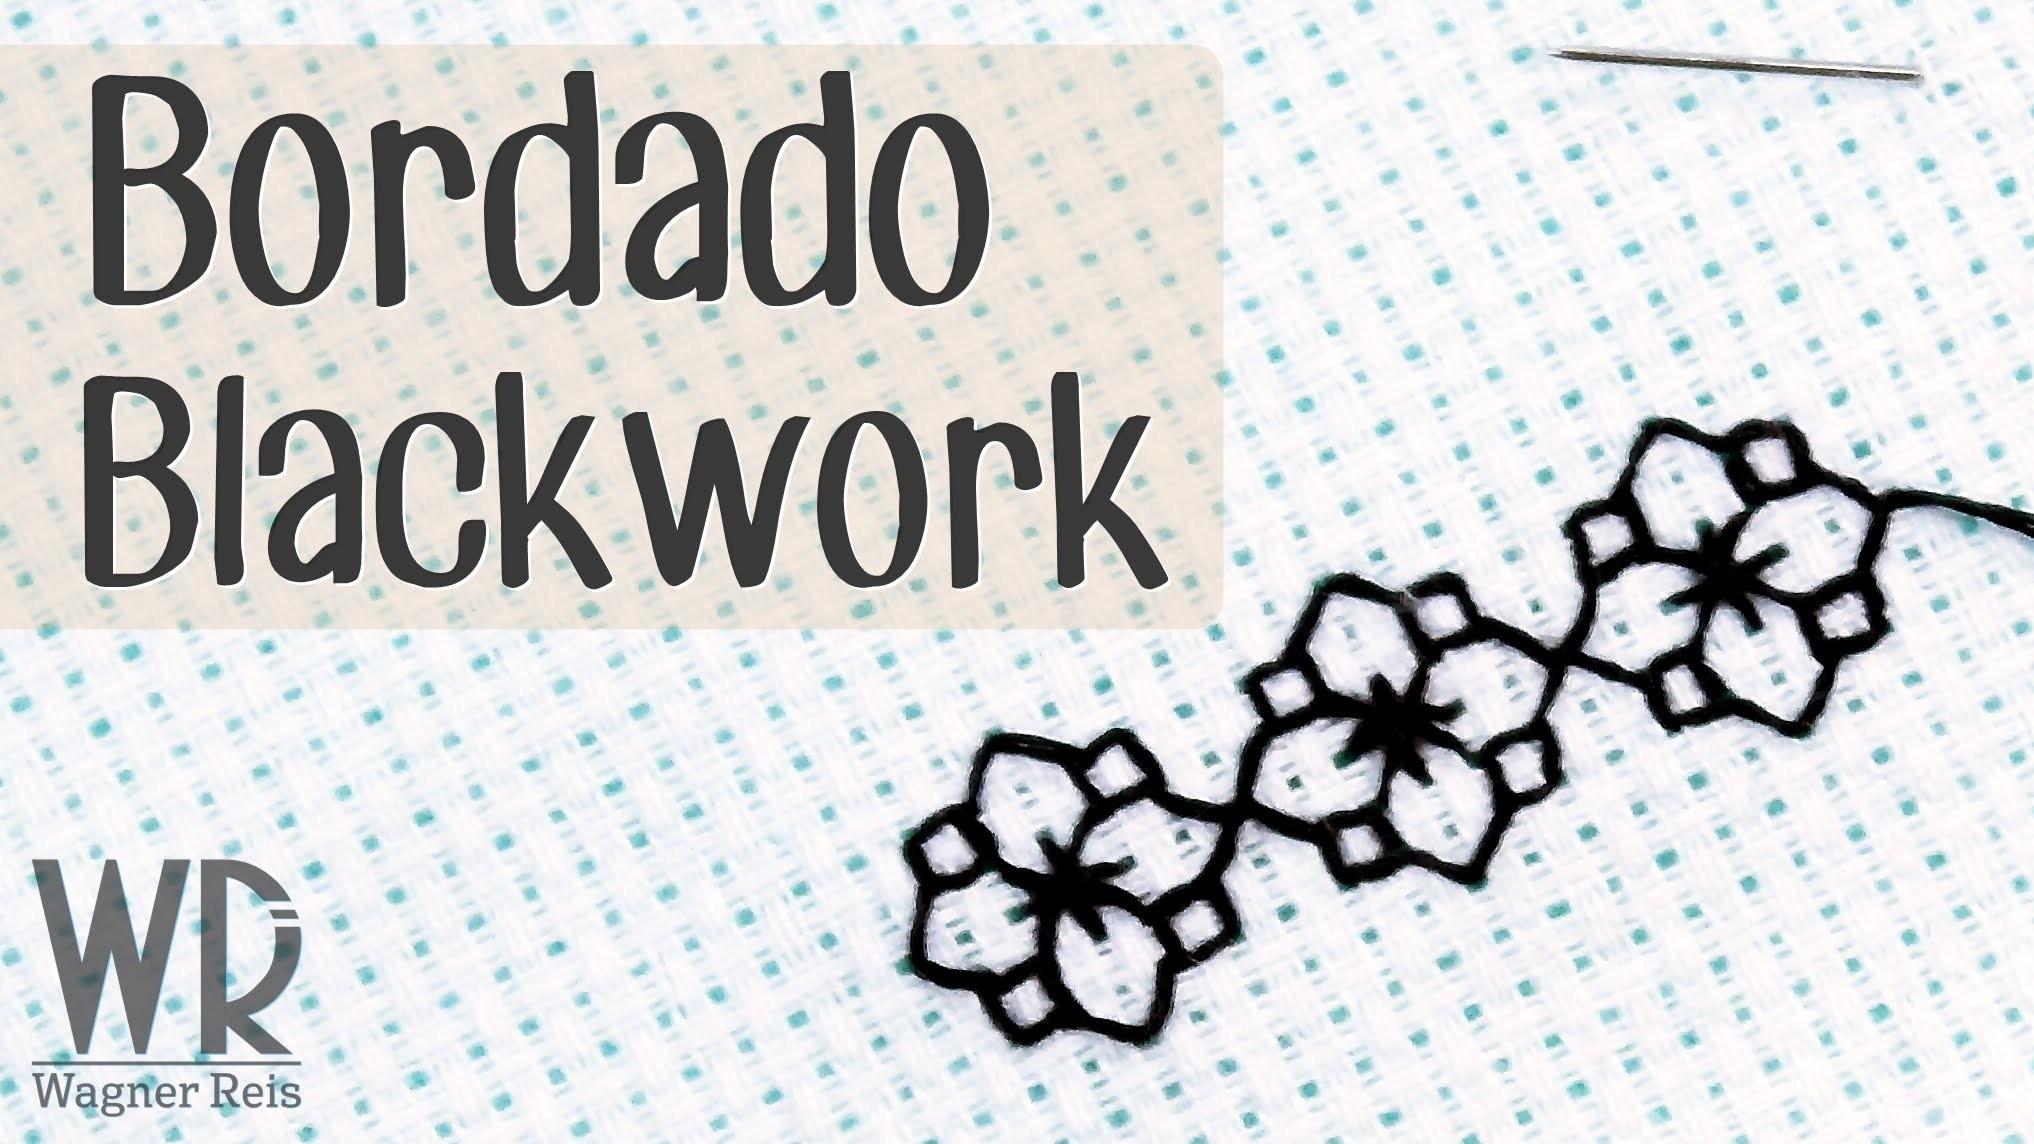 Bordado Blackwork - Tutorial completo